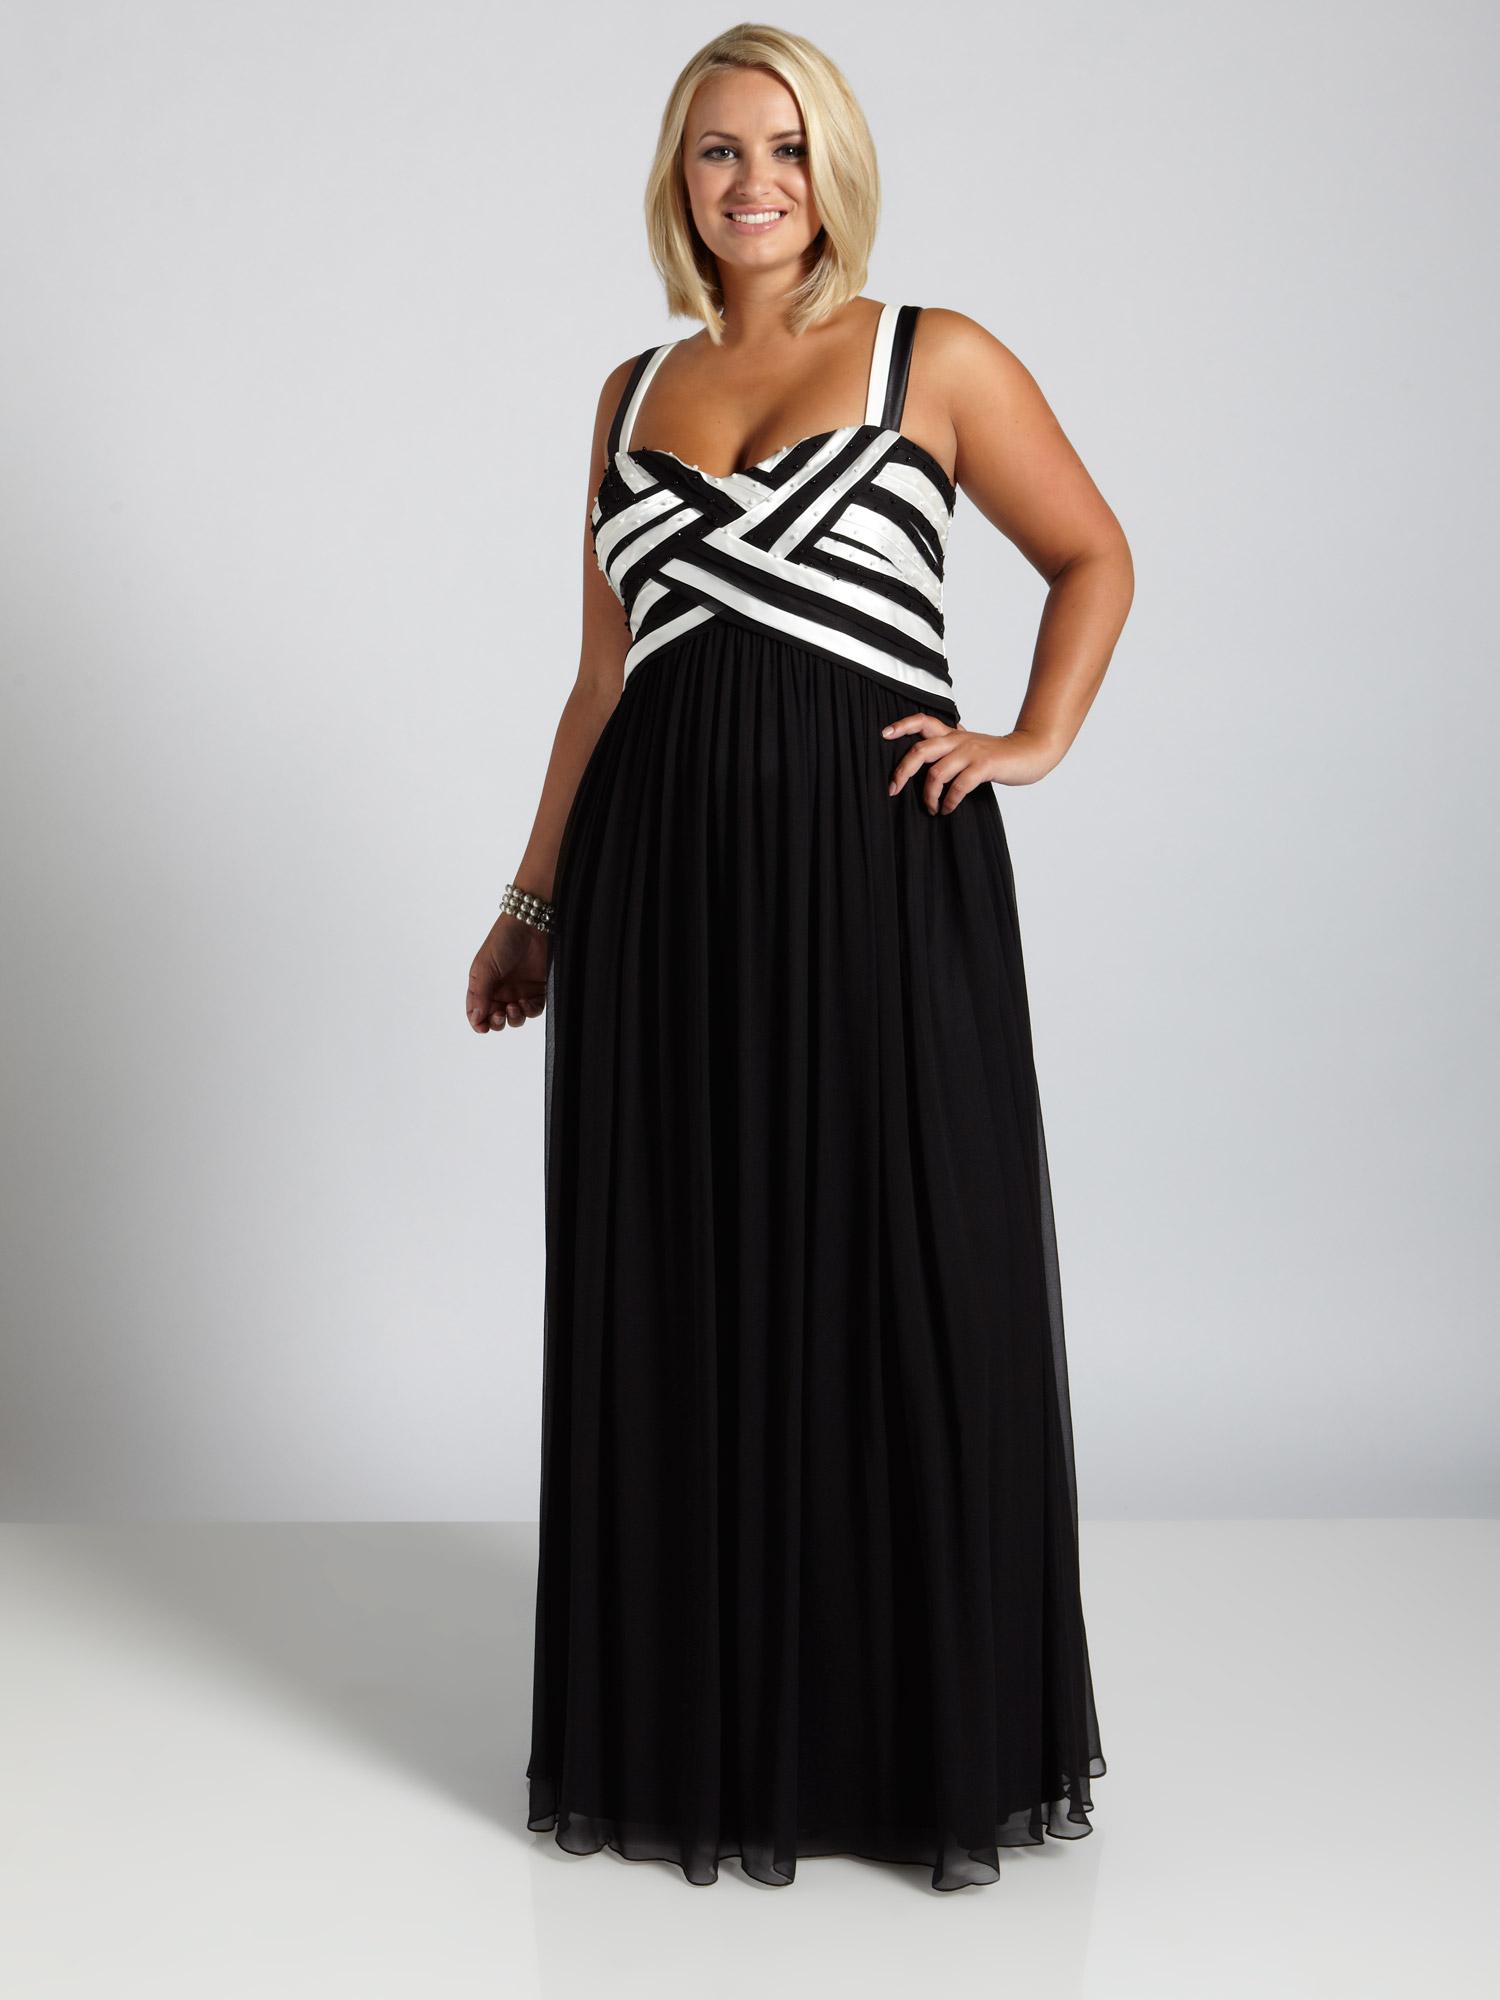 robe noir pour mariage - Robe Habille Pour Mariage Grande Taille